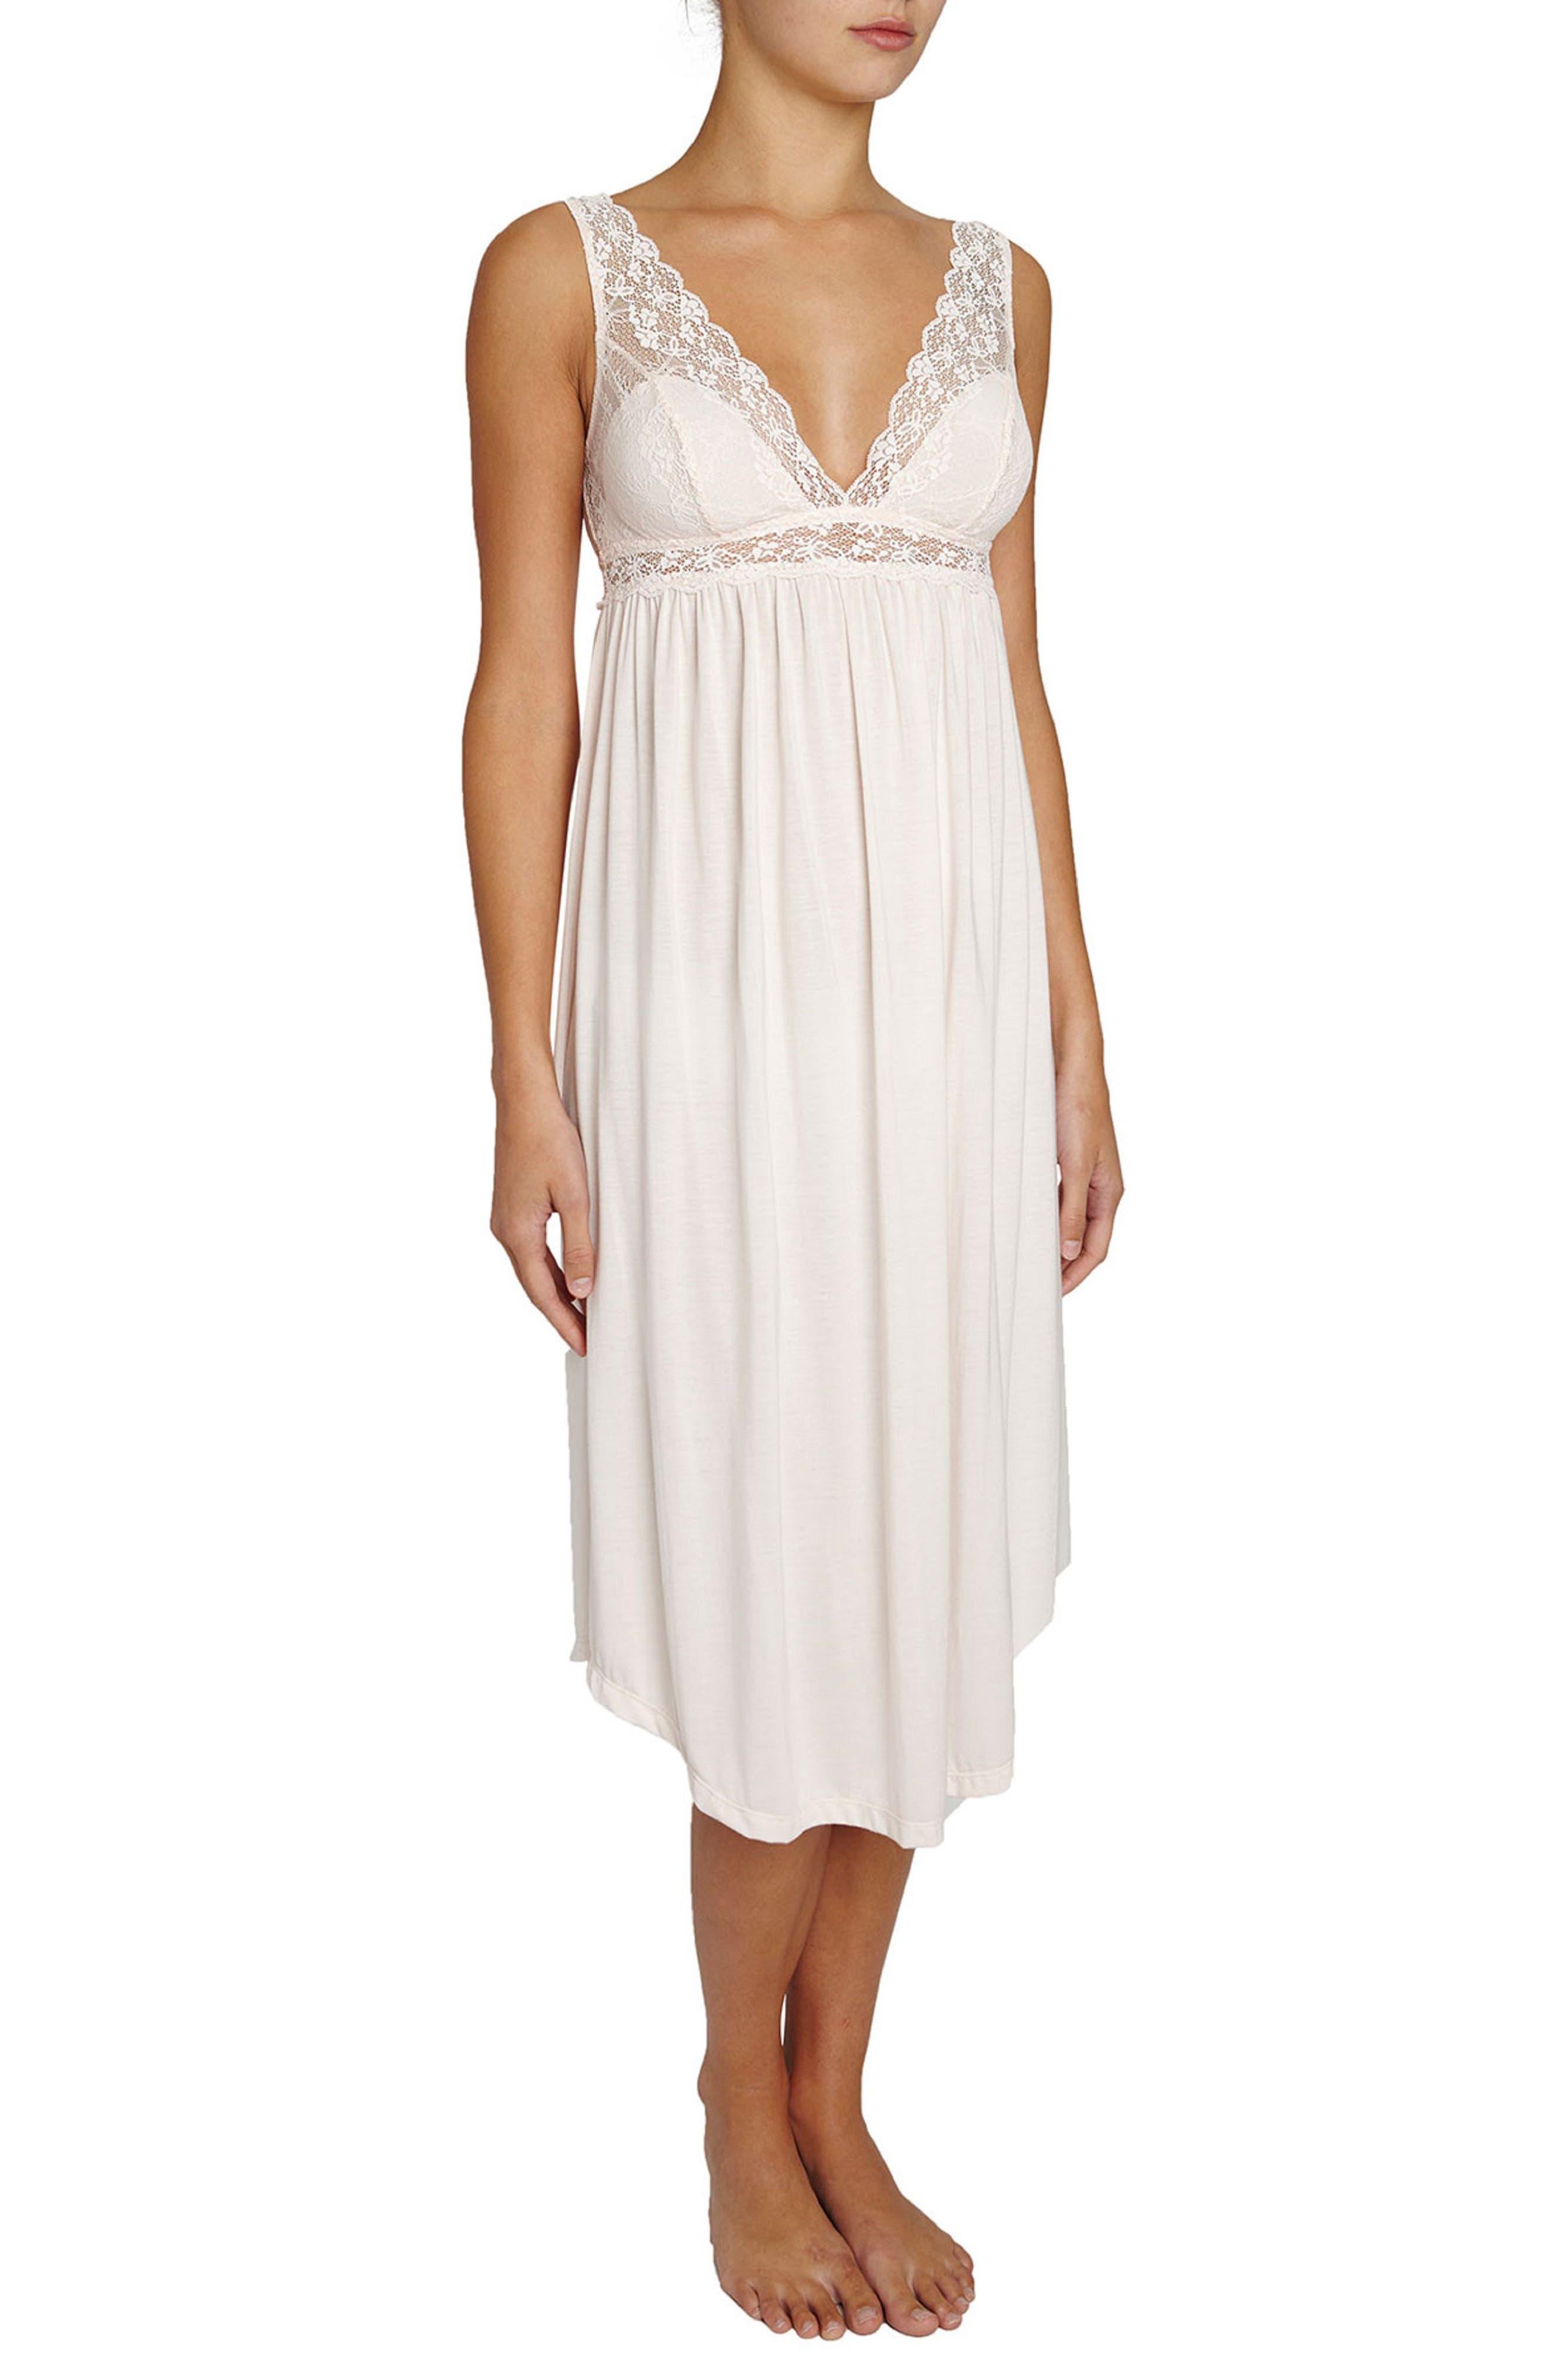 Eberjey Kiss the Bride Nightgown